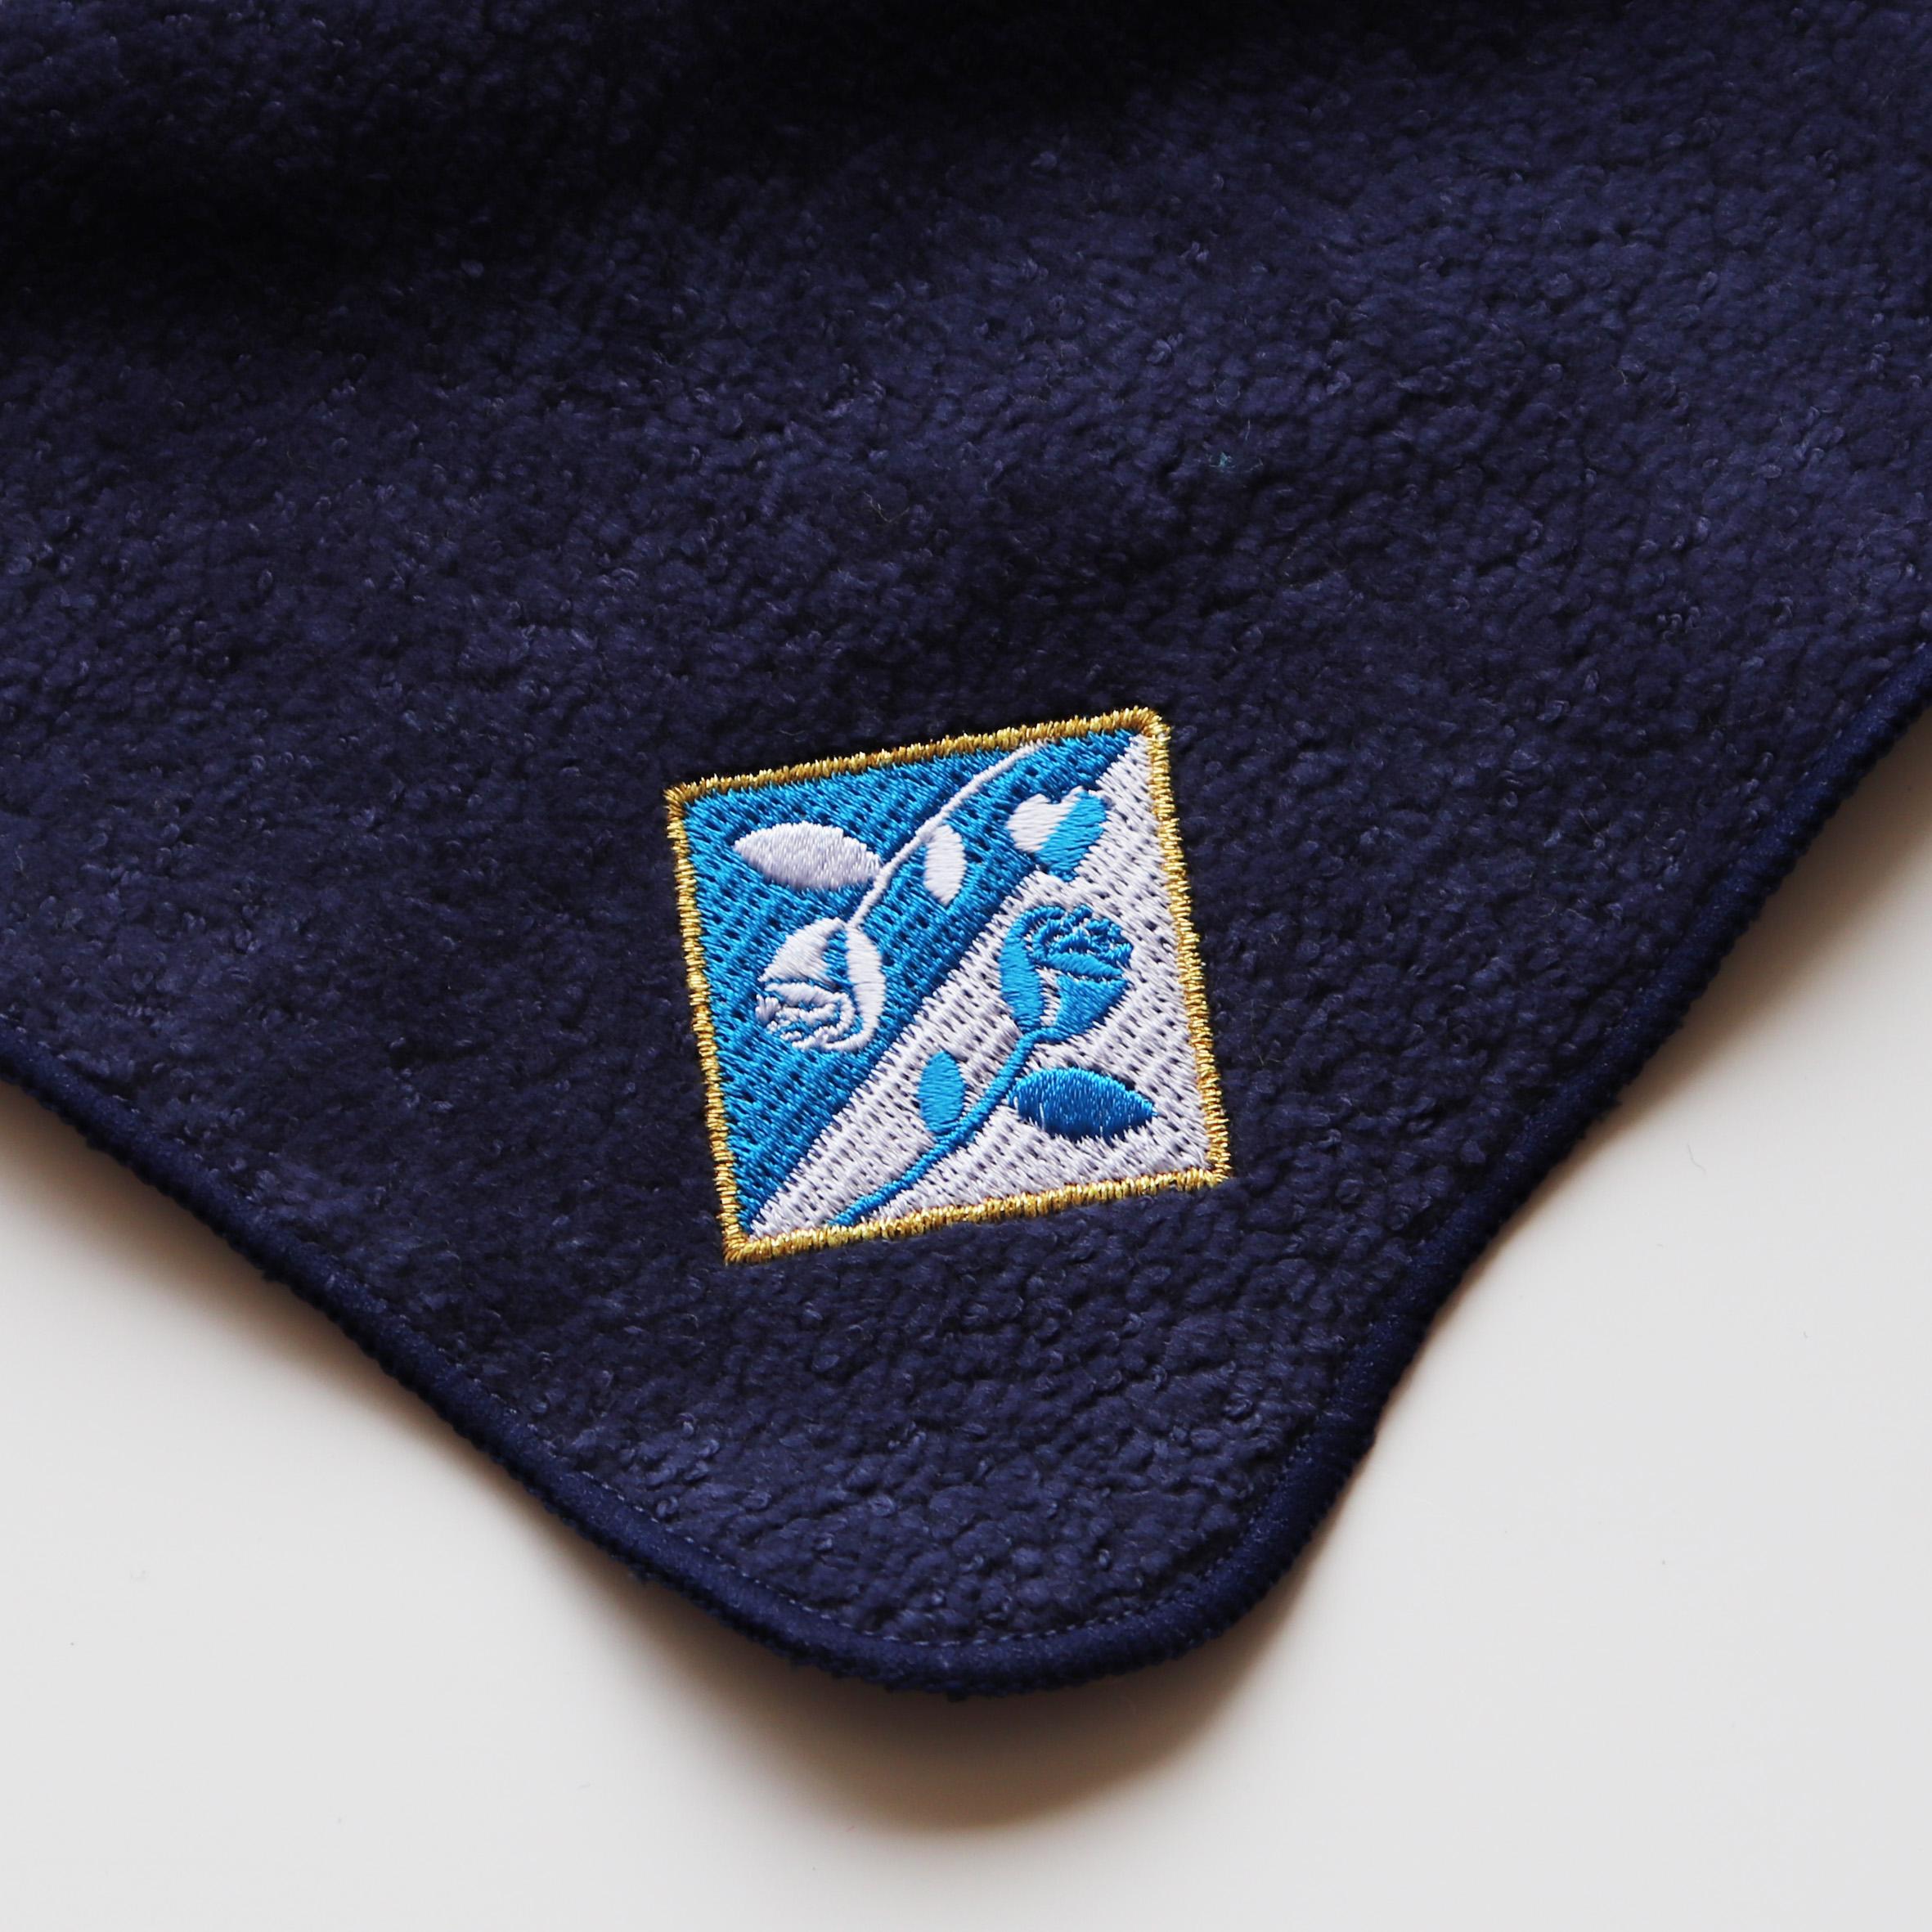 【15290】<br>オリジナル刺繍/C位置<br>YG500<br>ミニタオル<br>ネイビー